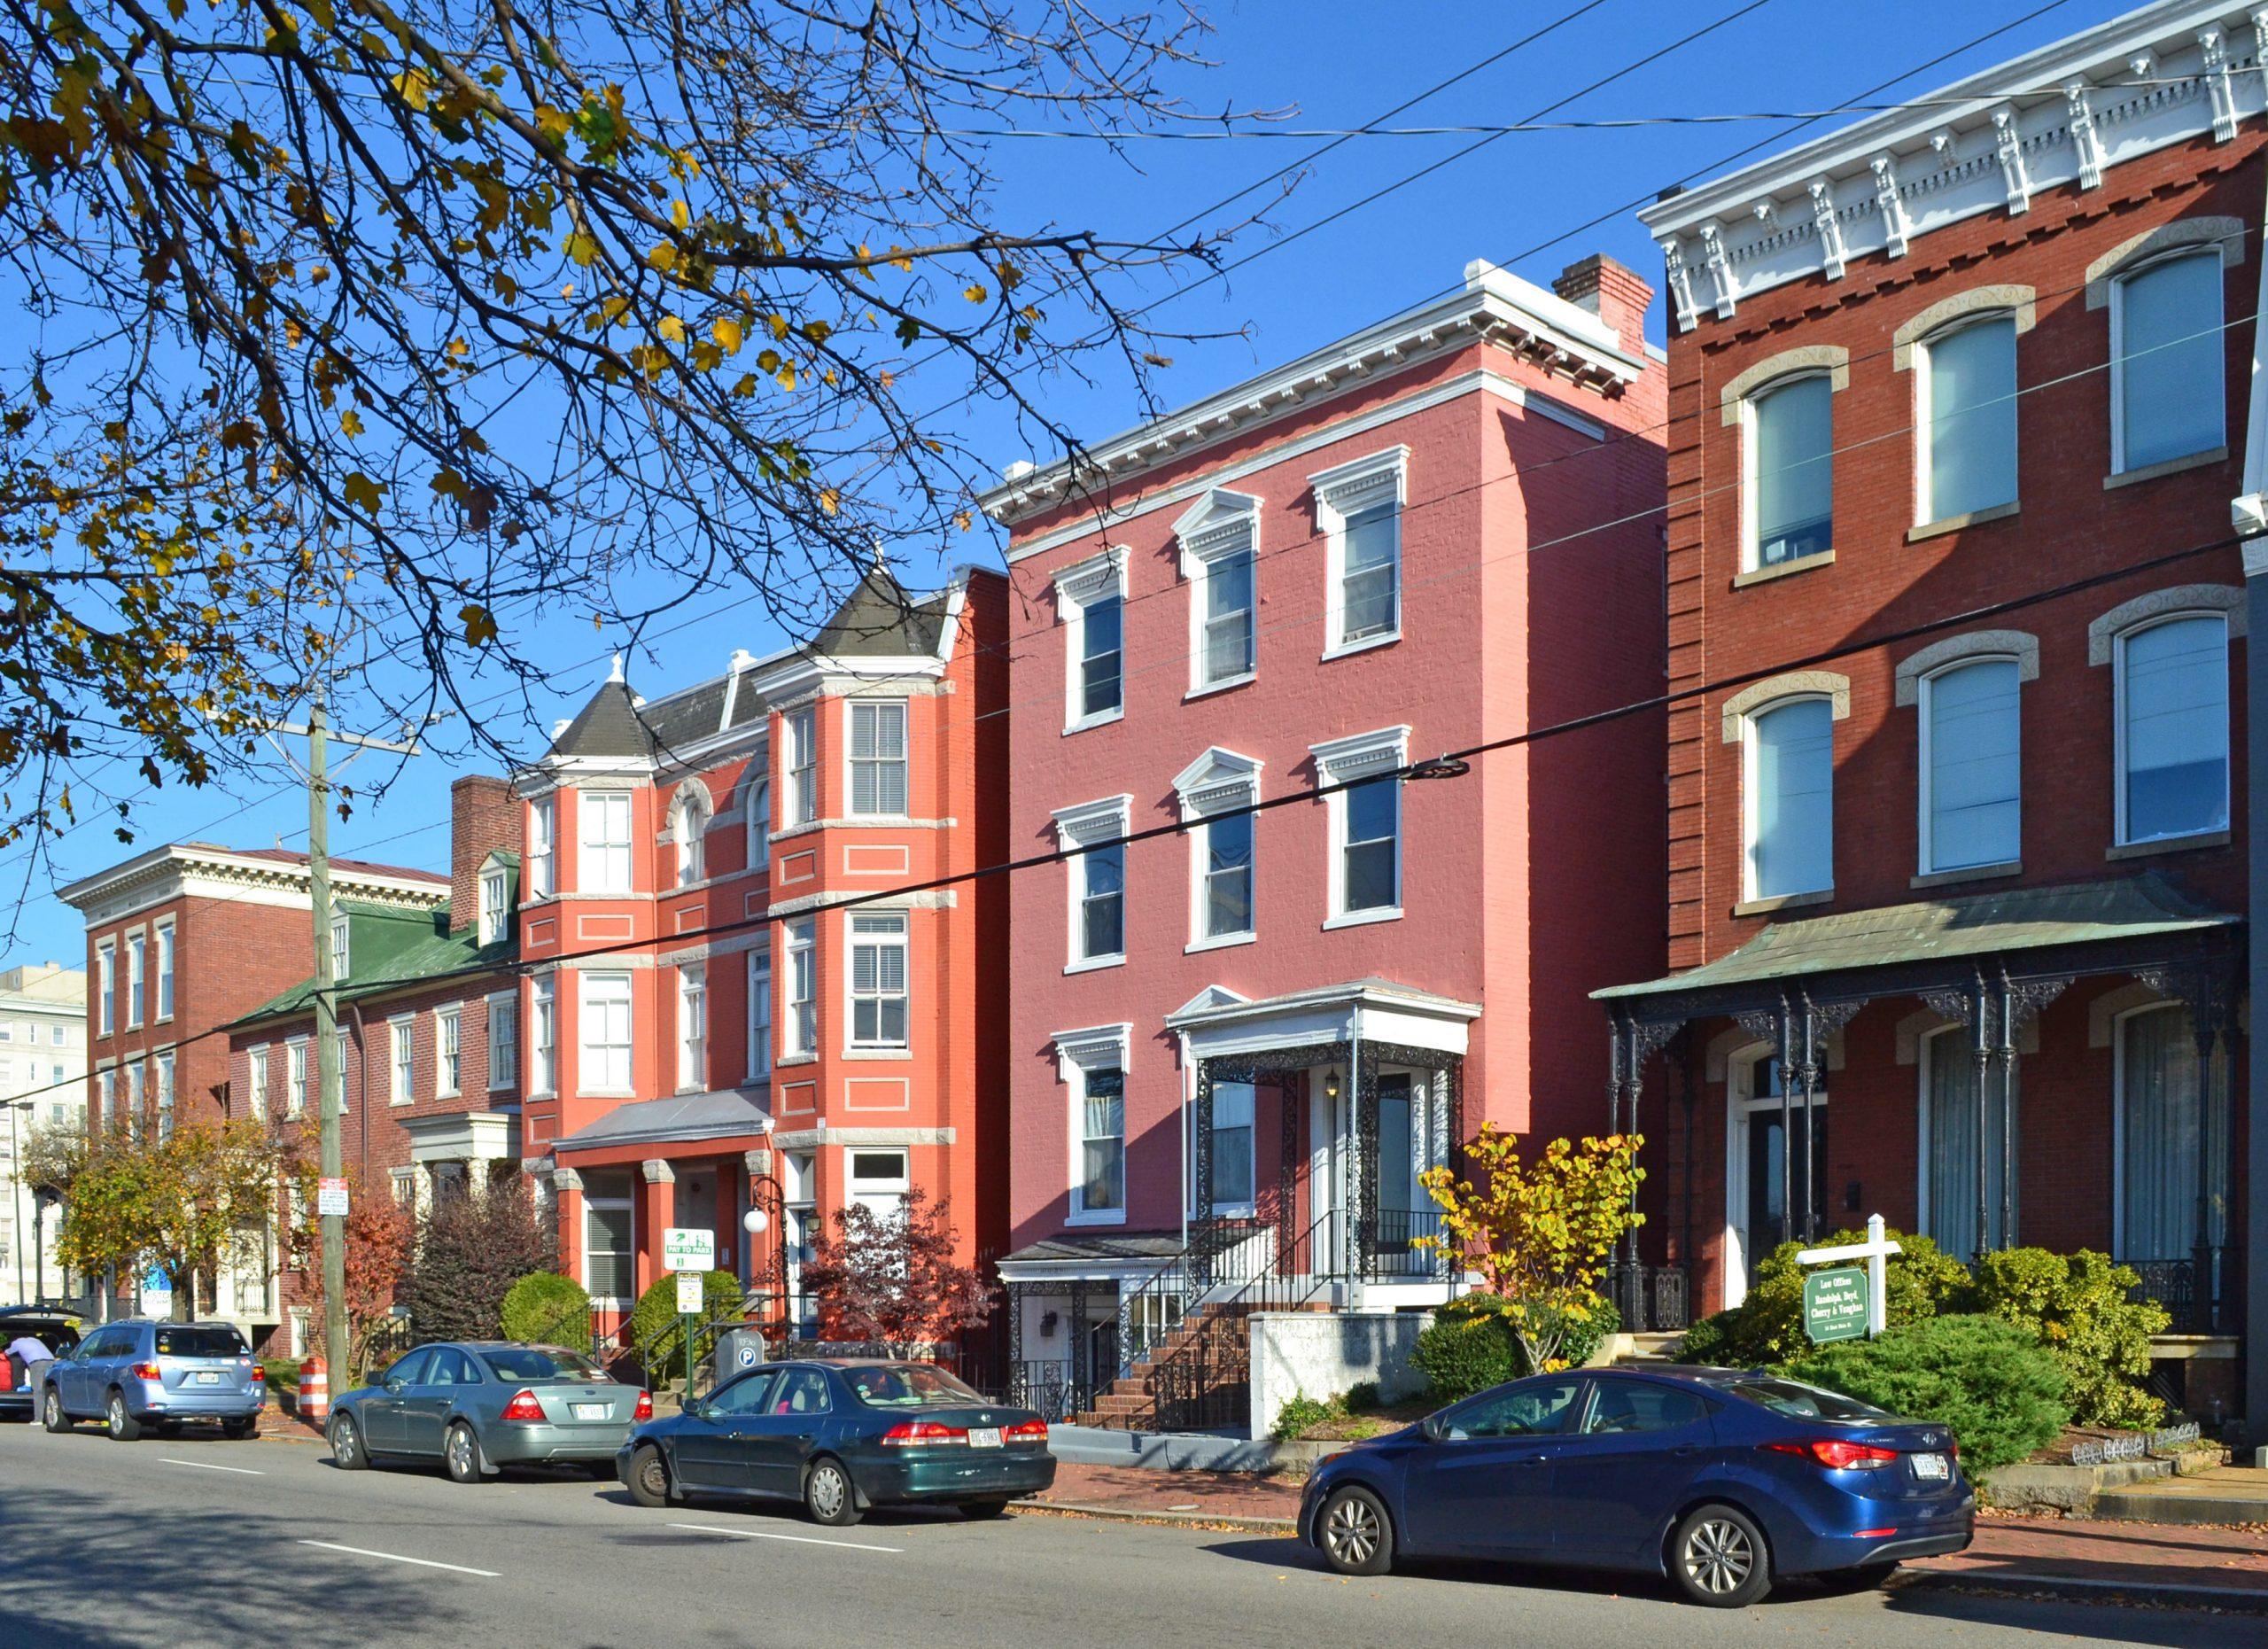 Monroe Ward Historic District